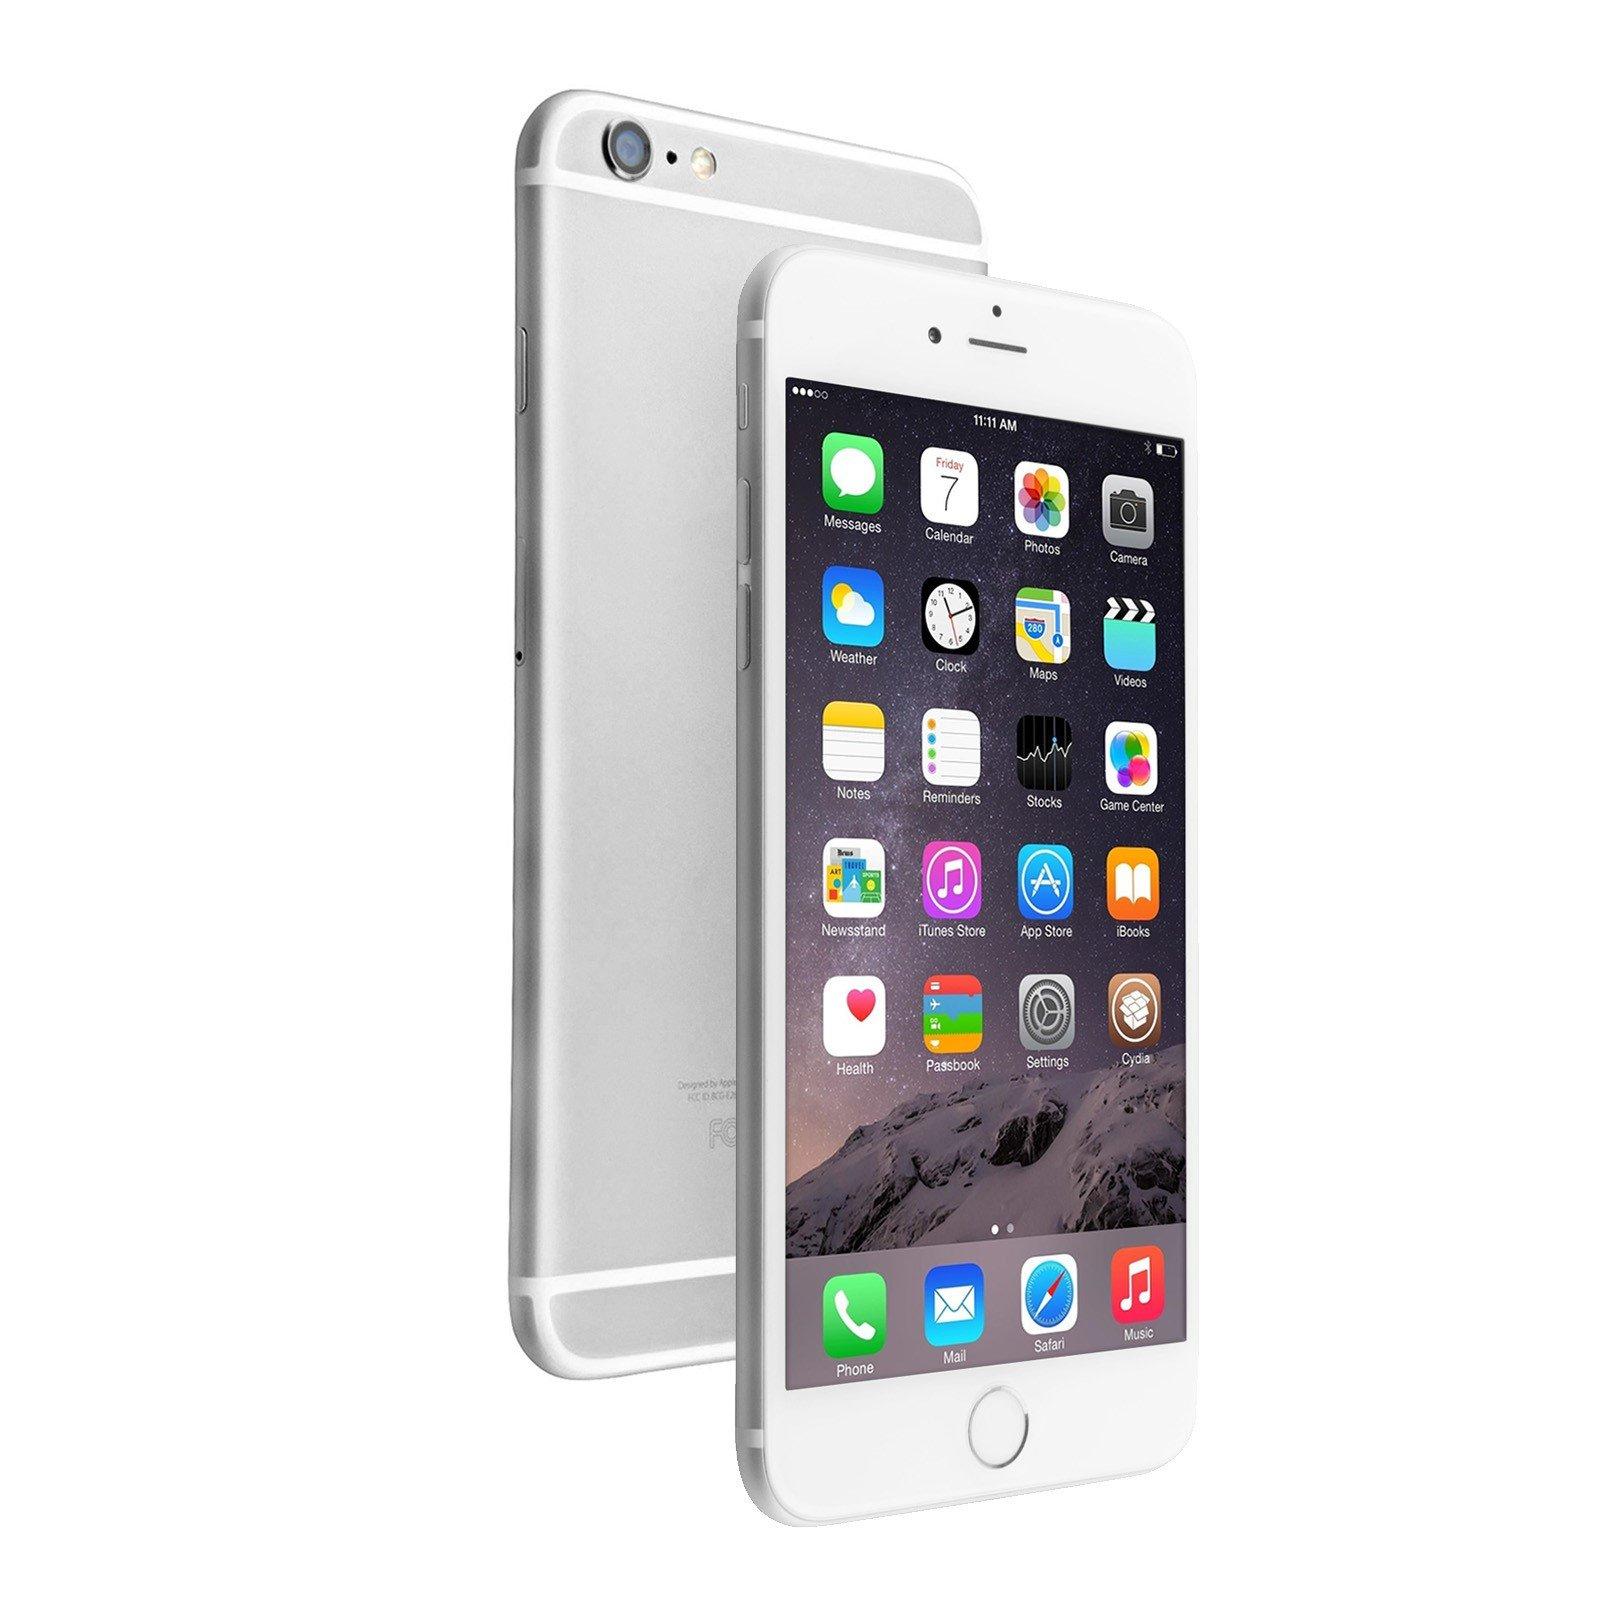 Info Harga Apple Certified Refurbished Iphone 5s 16gb Gsm Alba Atcs30 Jam Tangan Wanita Brown Silver Gold Cheap 3g Unlocked Find Deals Freigegeben Zum Verkauf Get